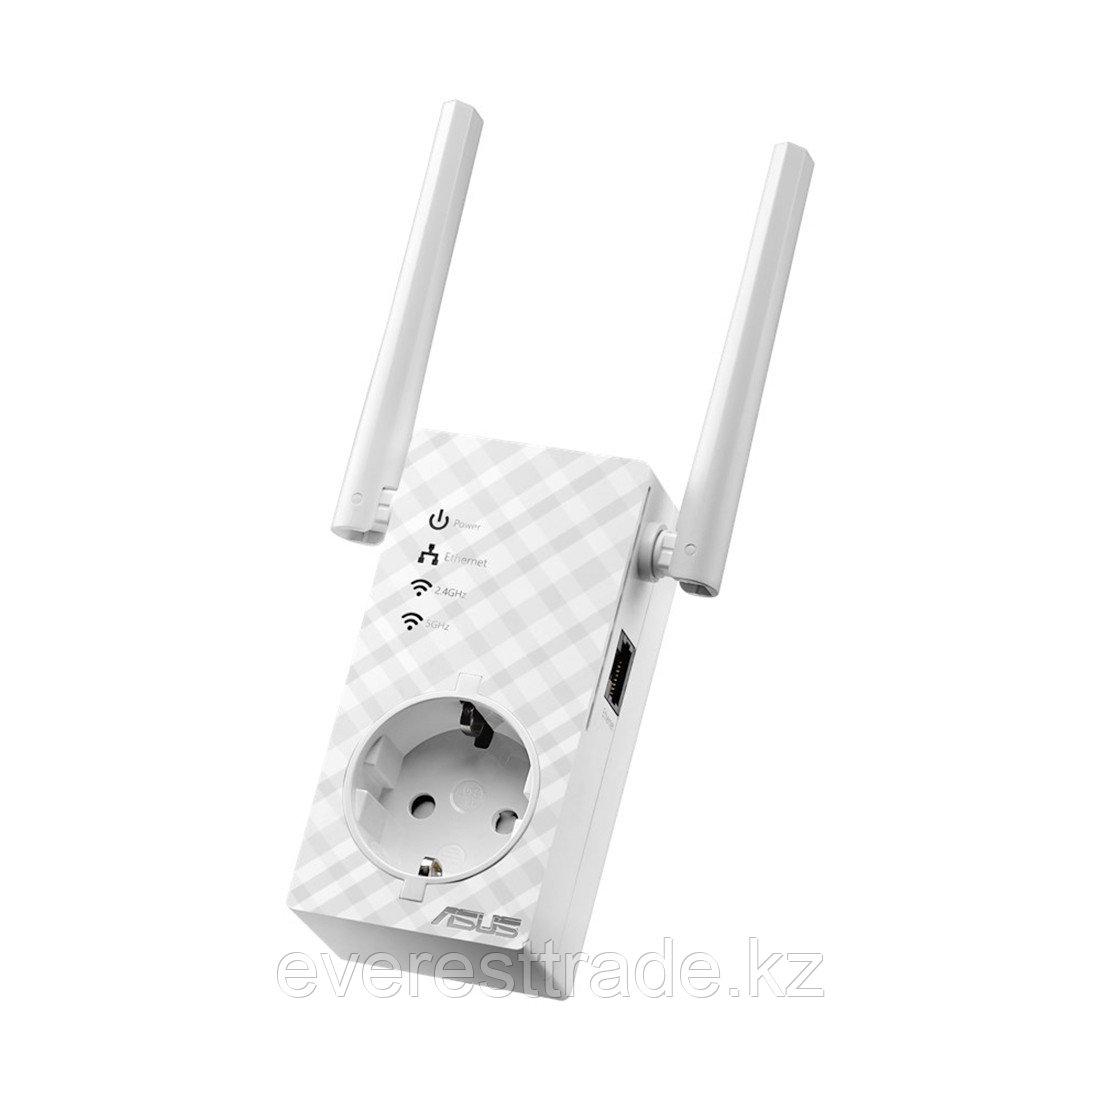 ASUS Точка доступа ASUS RP-AC53/Усилитель Wi-Fi сигнала